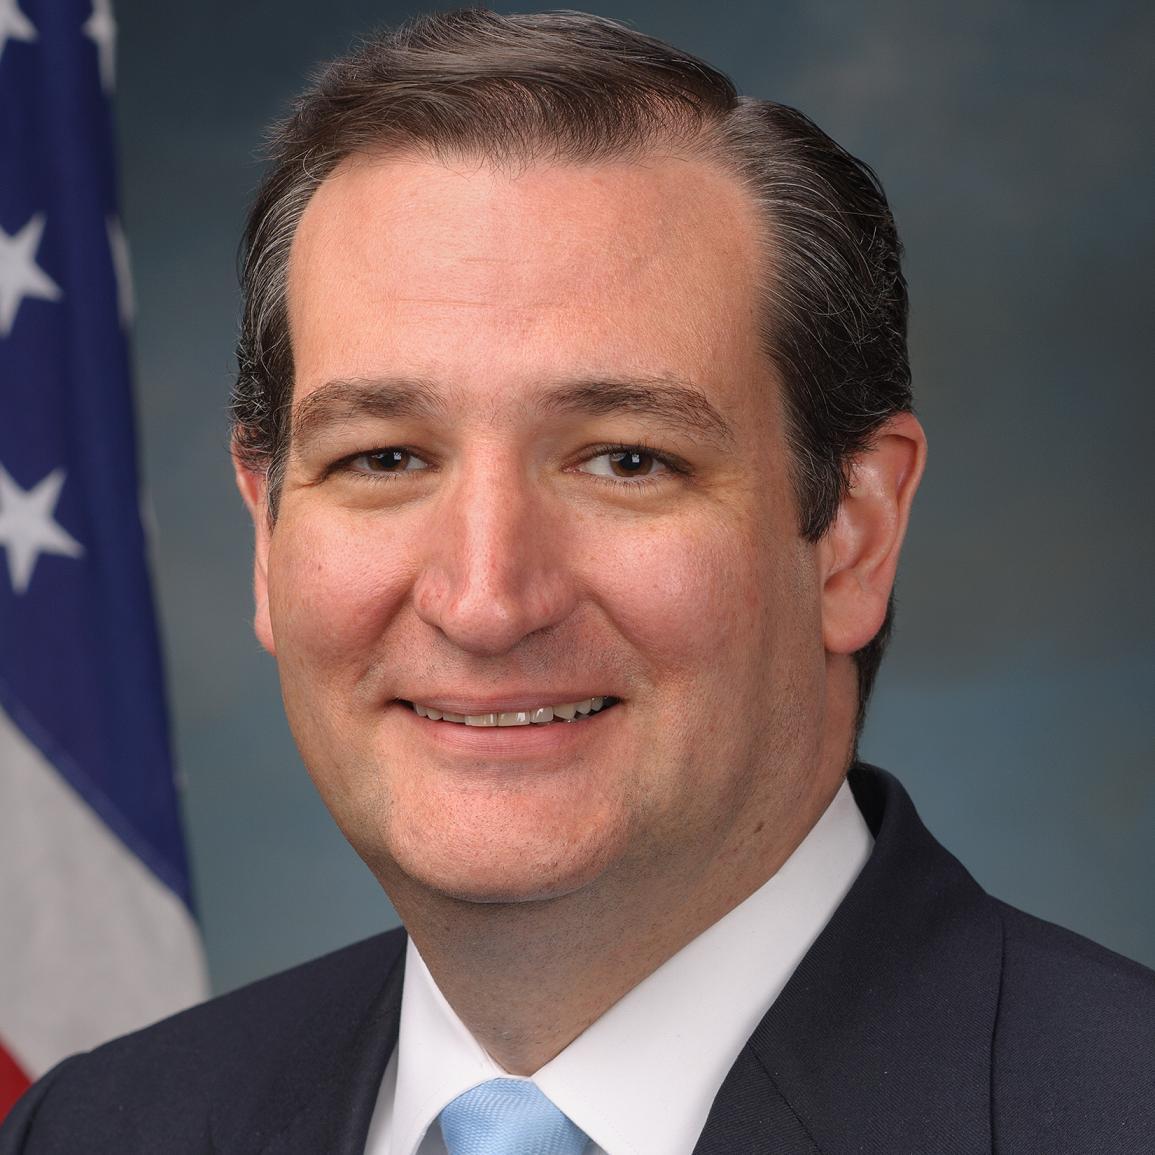 Ted Cruz Bio, Net Worth, Facts